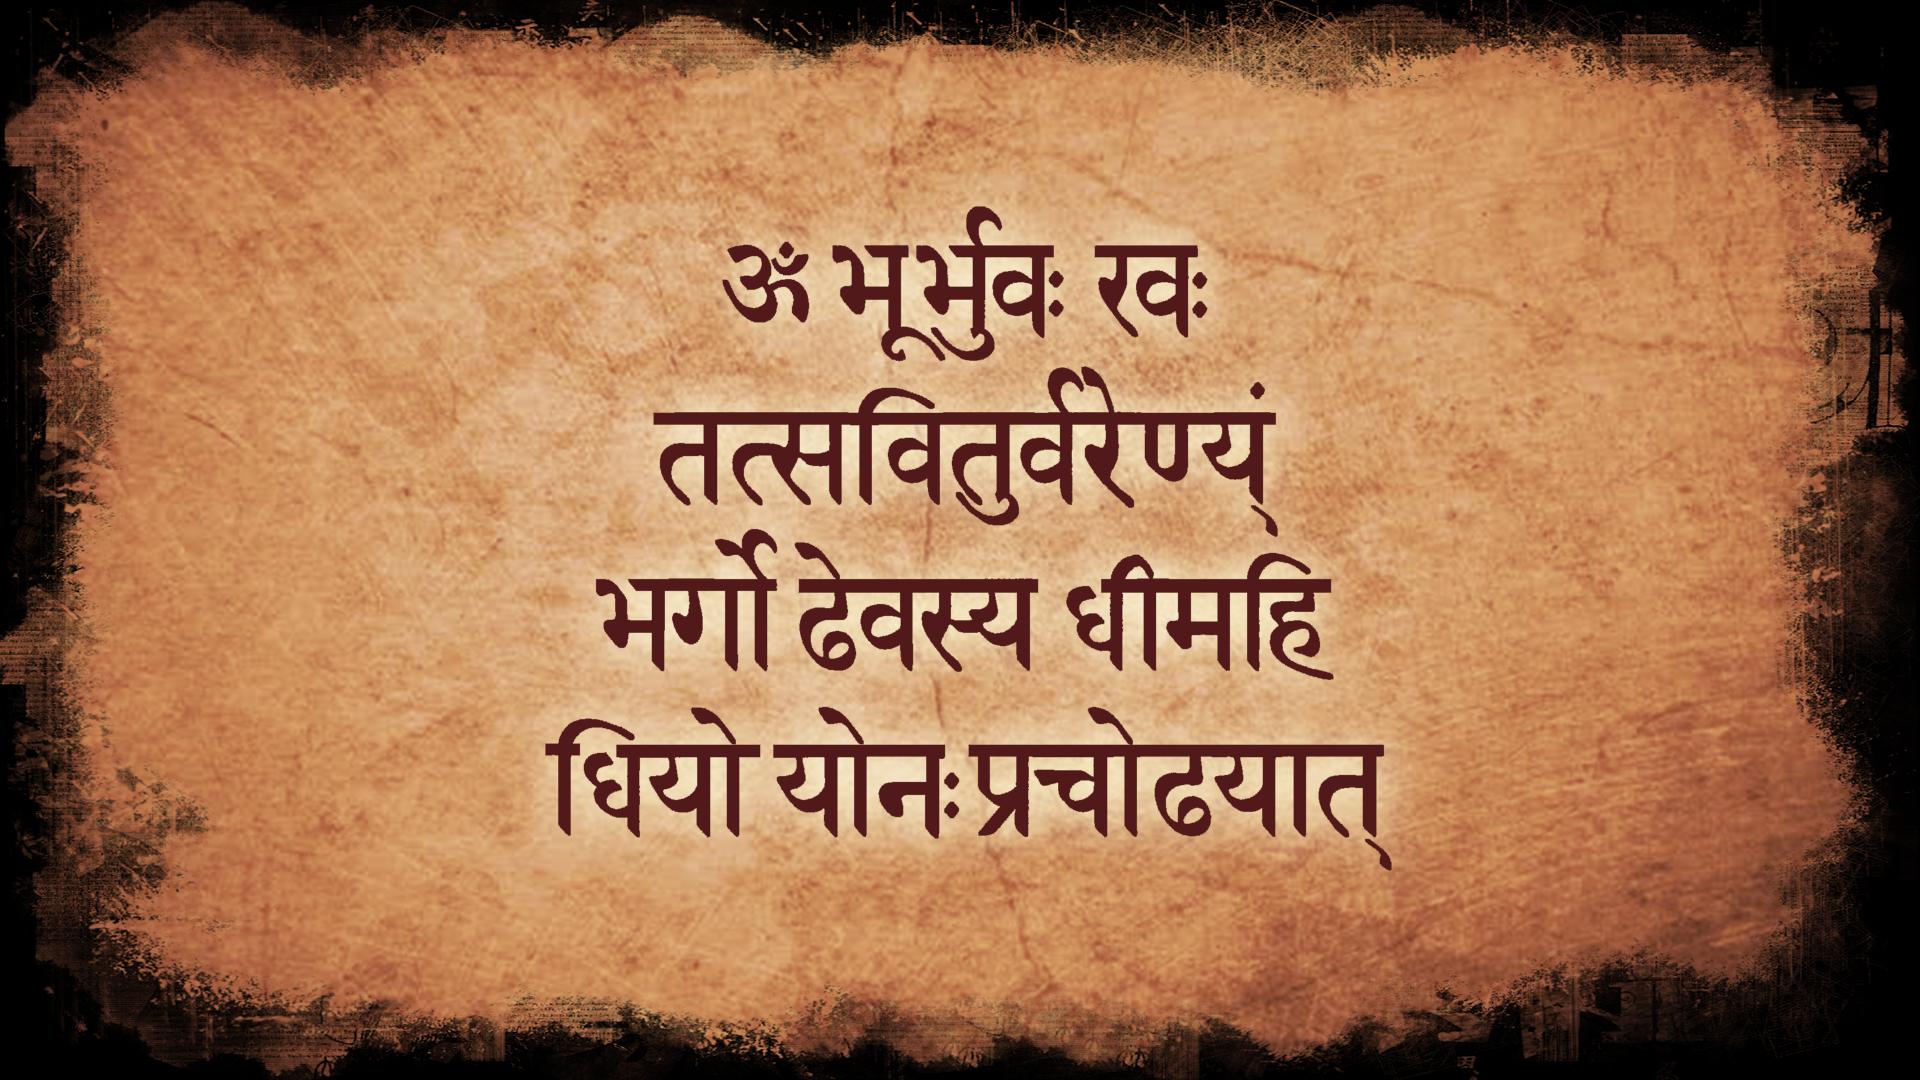 Gayatri mantra wallpaper image download